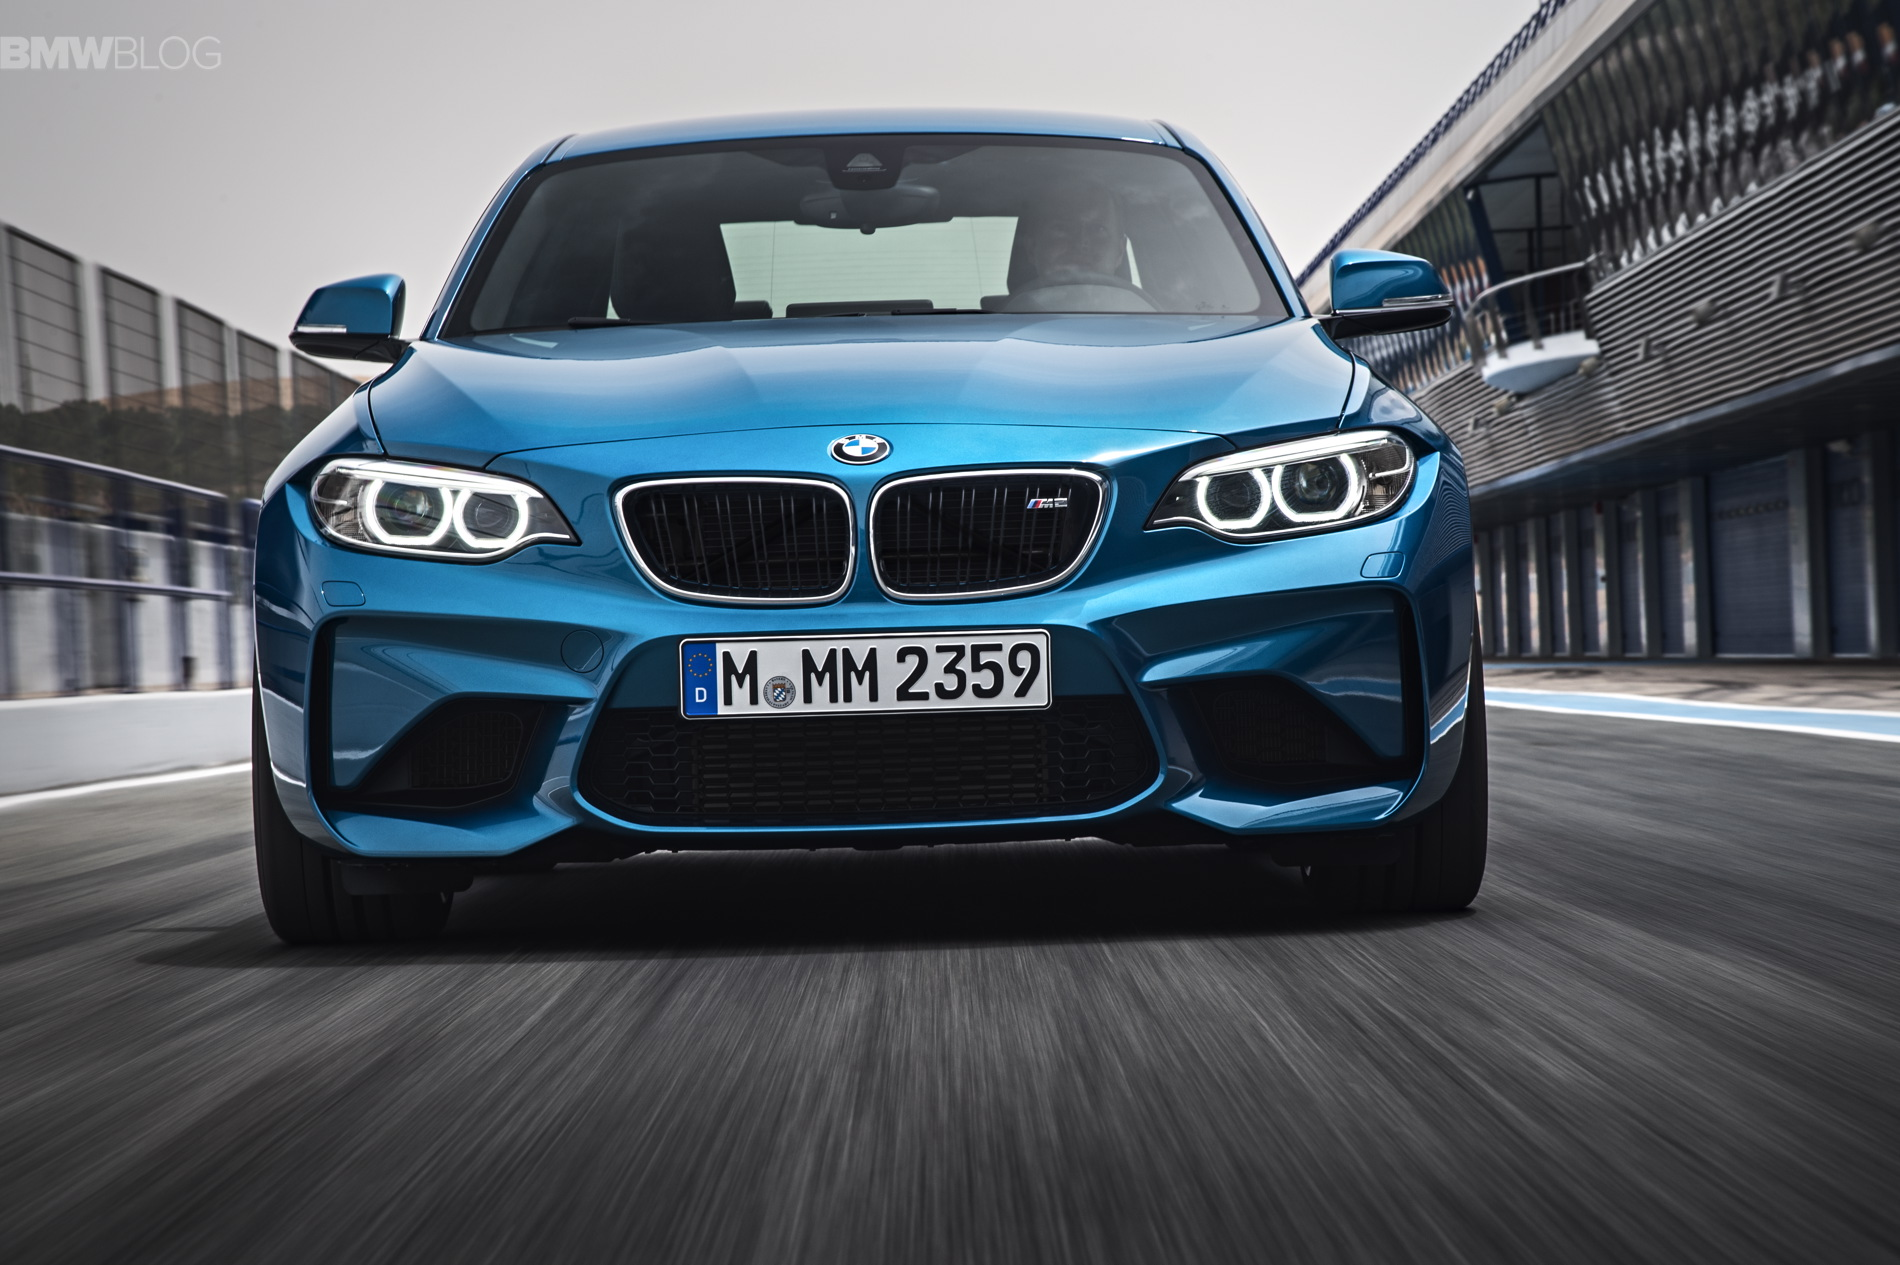 BMW M2 images 25